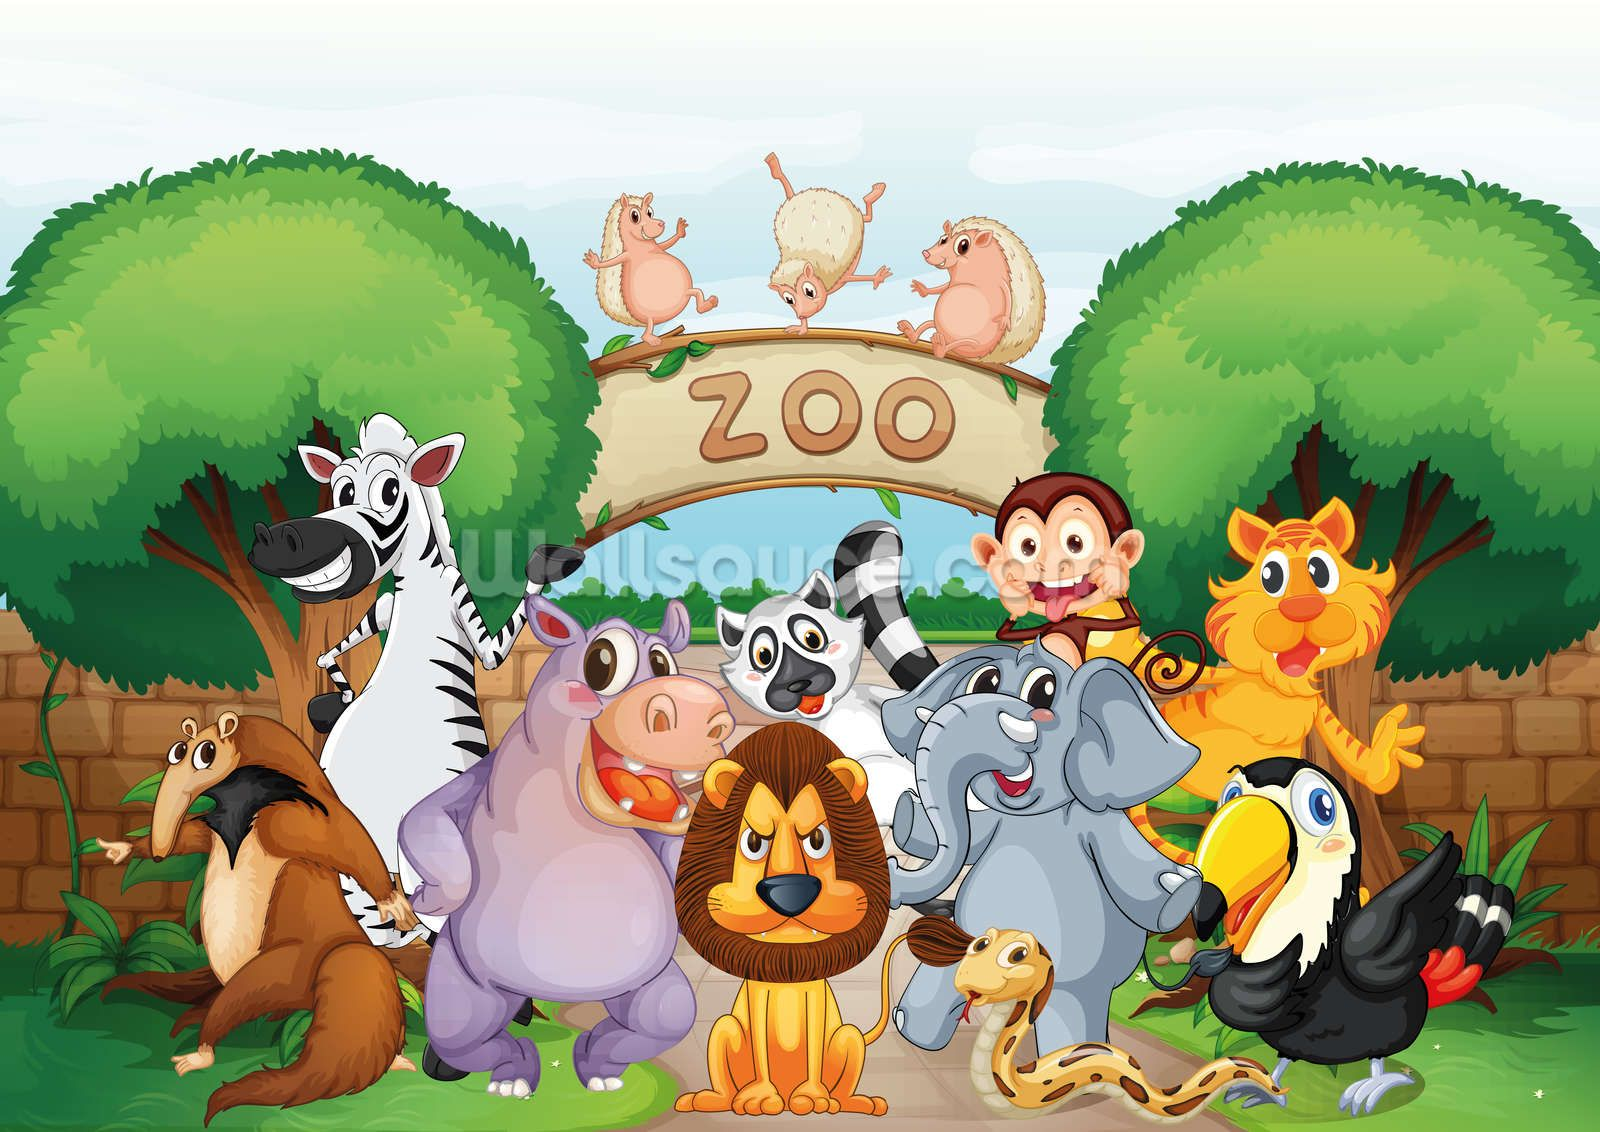 Animal Zoo Wallpaper Mural Wallsauce Us Cartoon Zoo Animals Zoo Animals Cartoon Animals